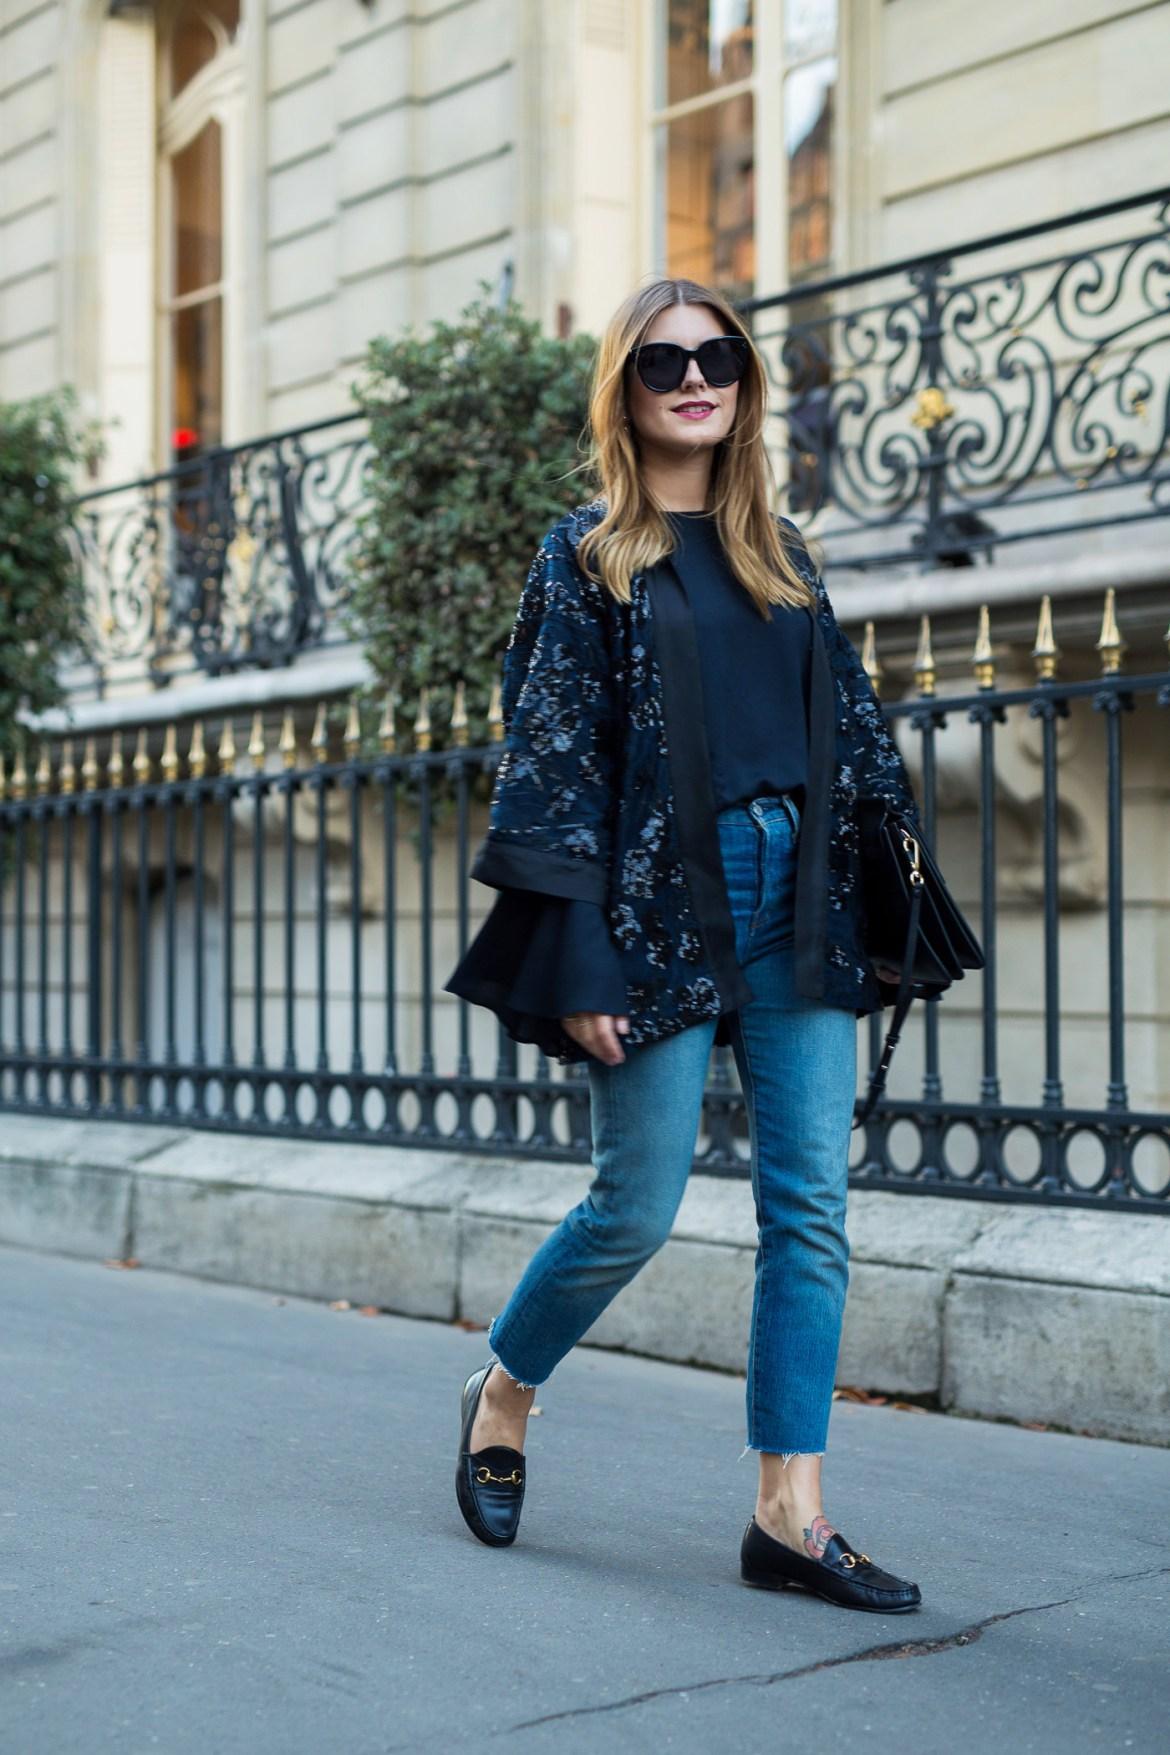 paris_fashion_week_kimono_and_bell_sleeves_3